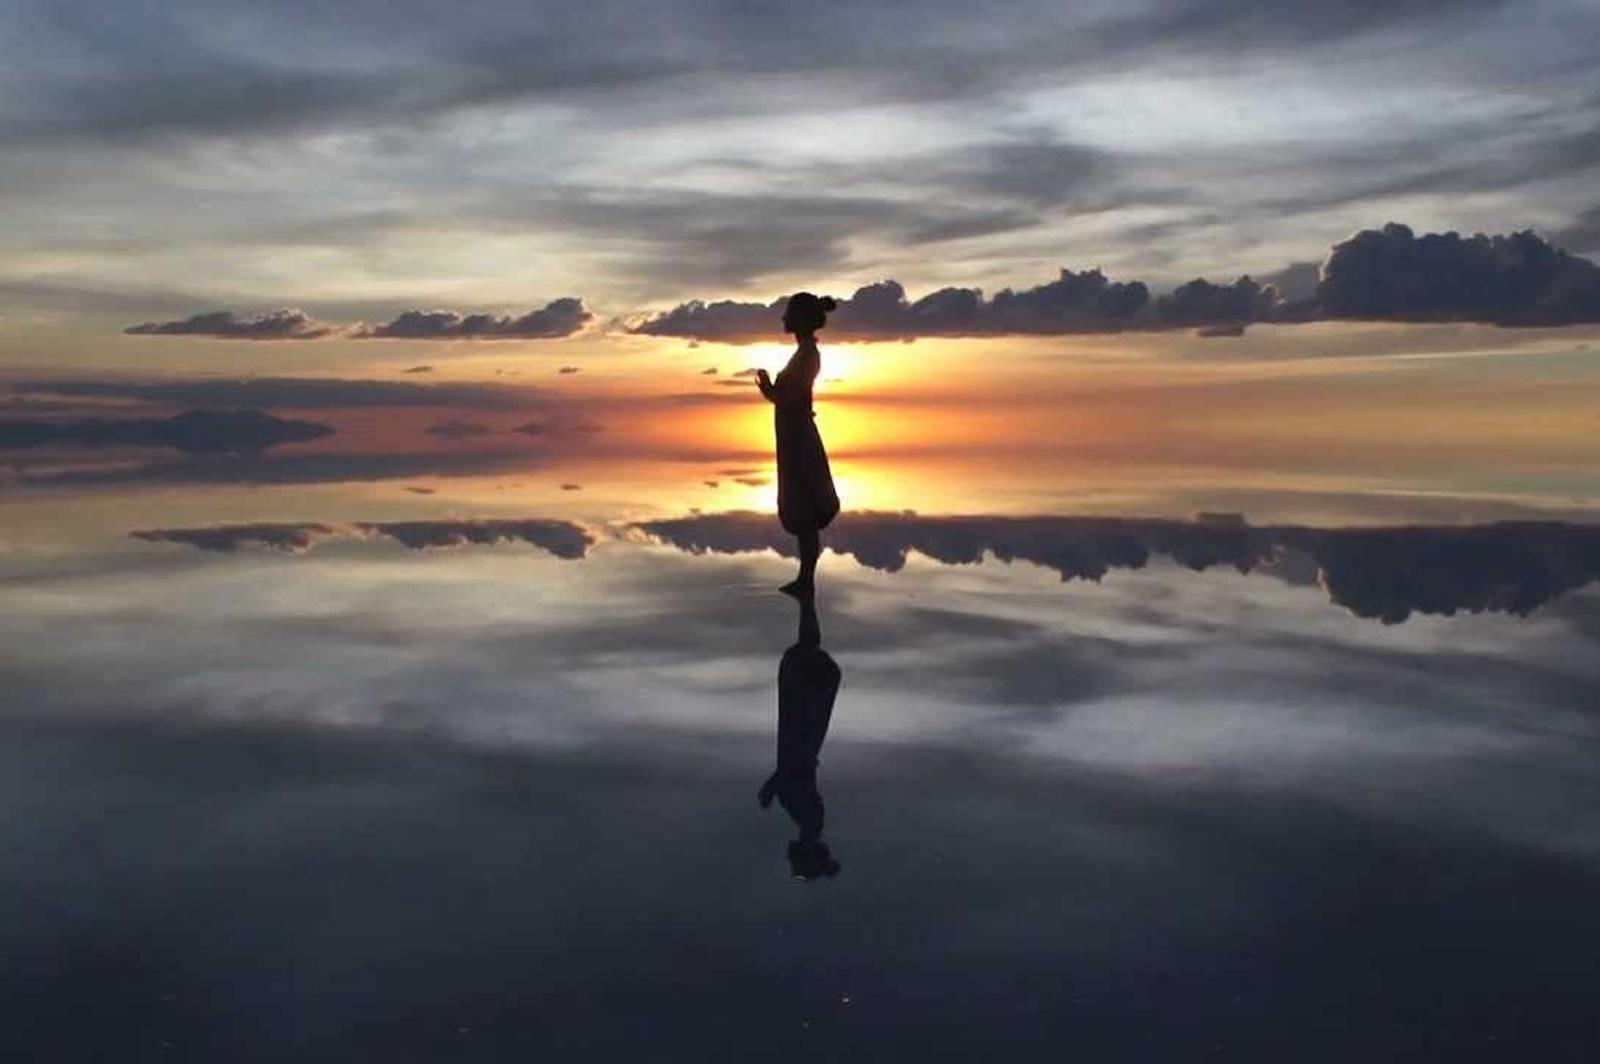 Uyuni Salt Flat Twilight Reflections And Stargazing Tour